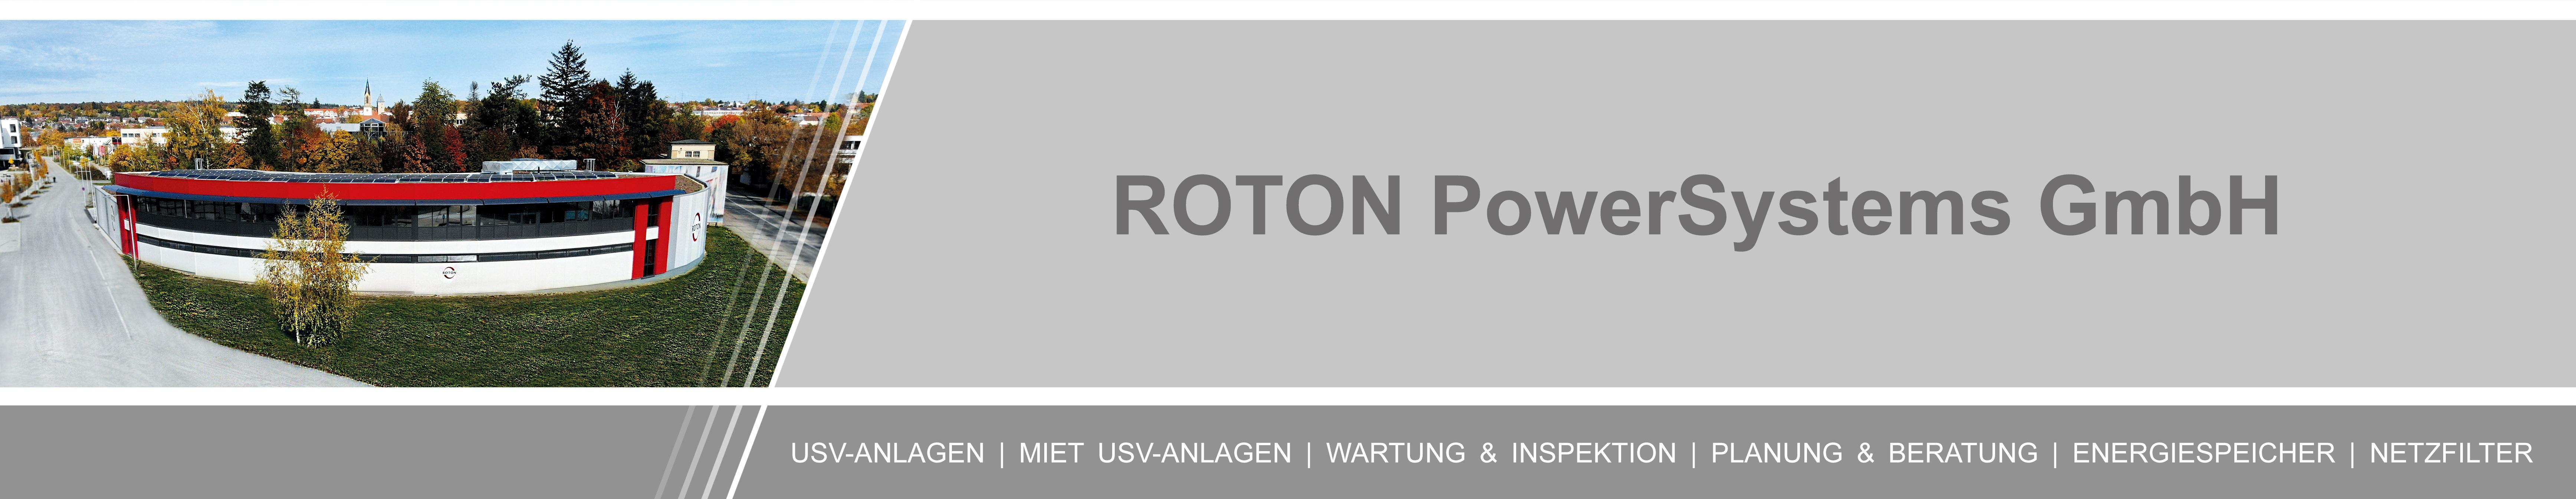 Unternehmen - ROTON PowerSystems GmbH